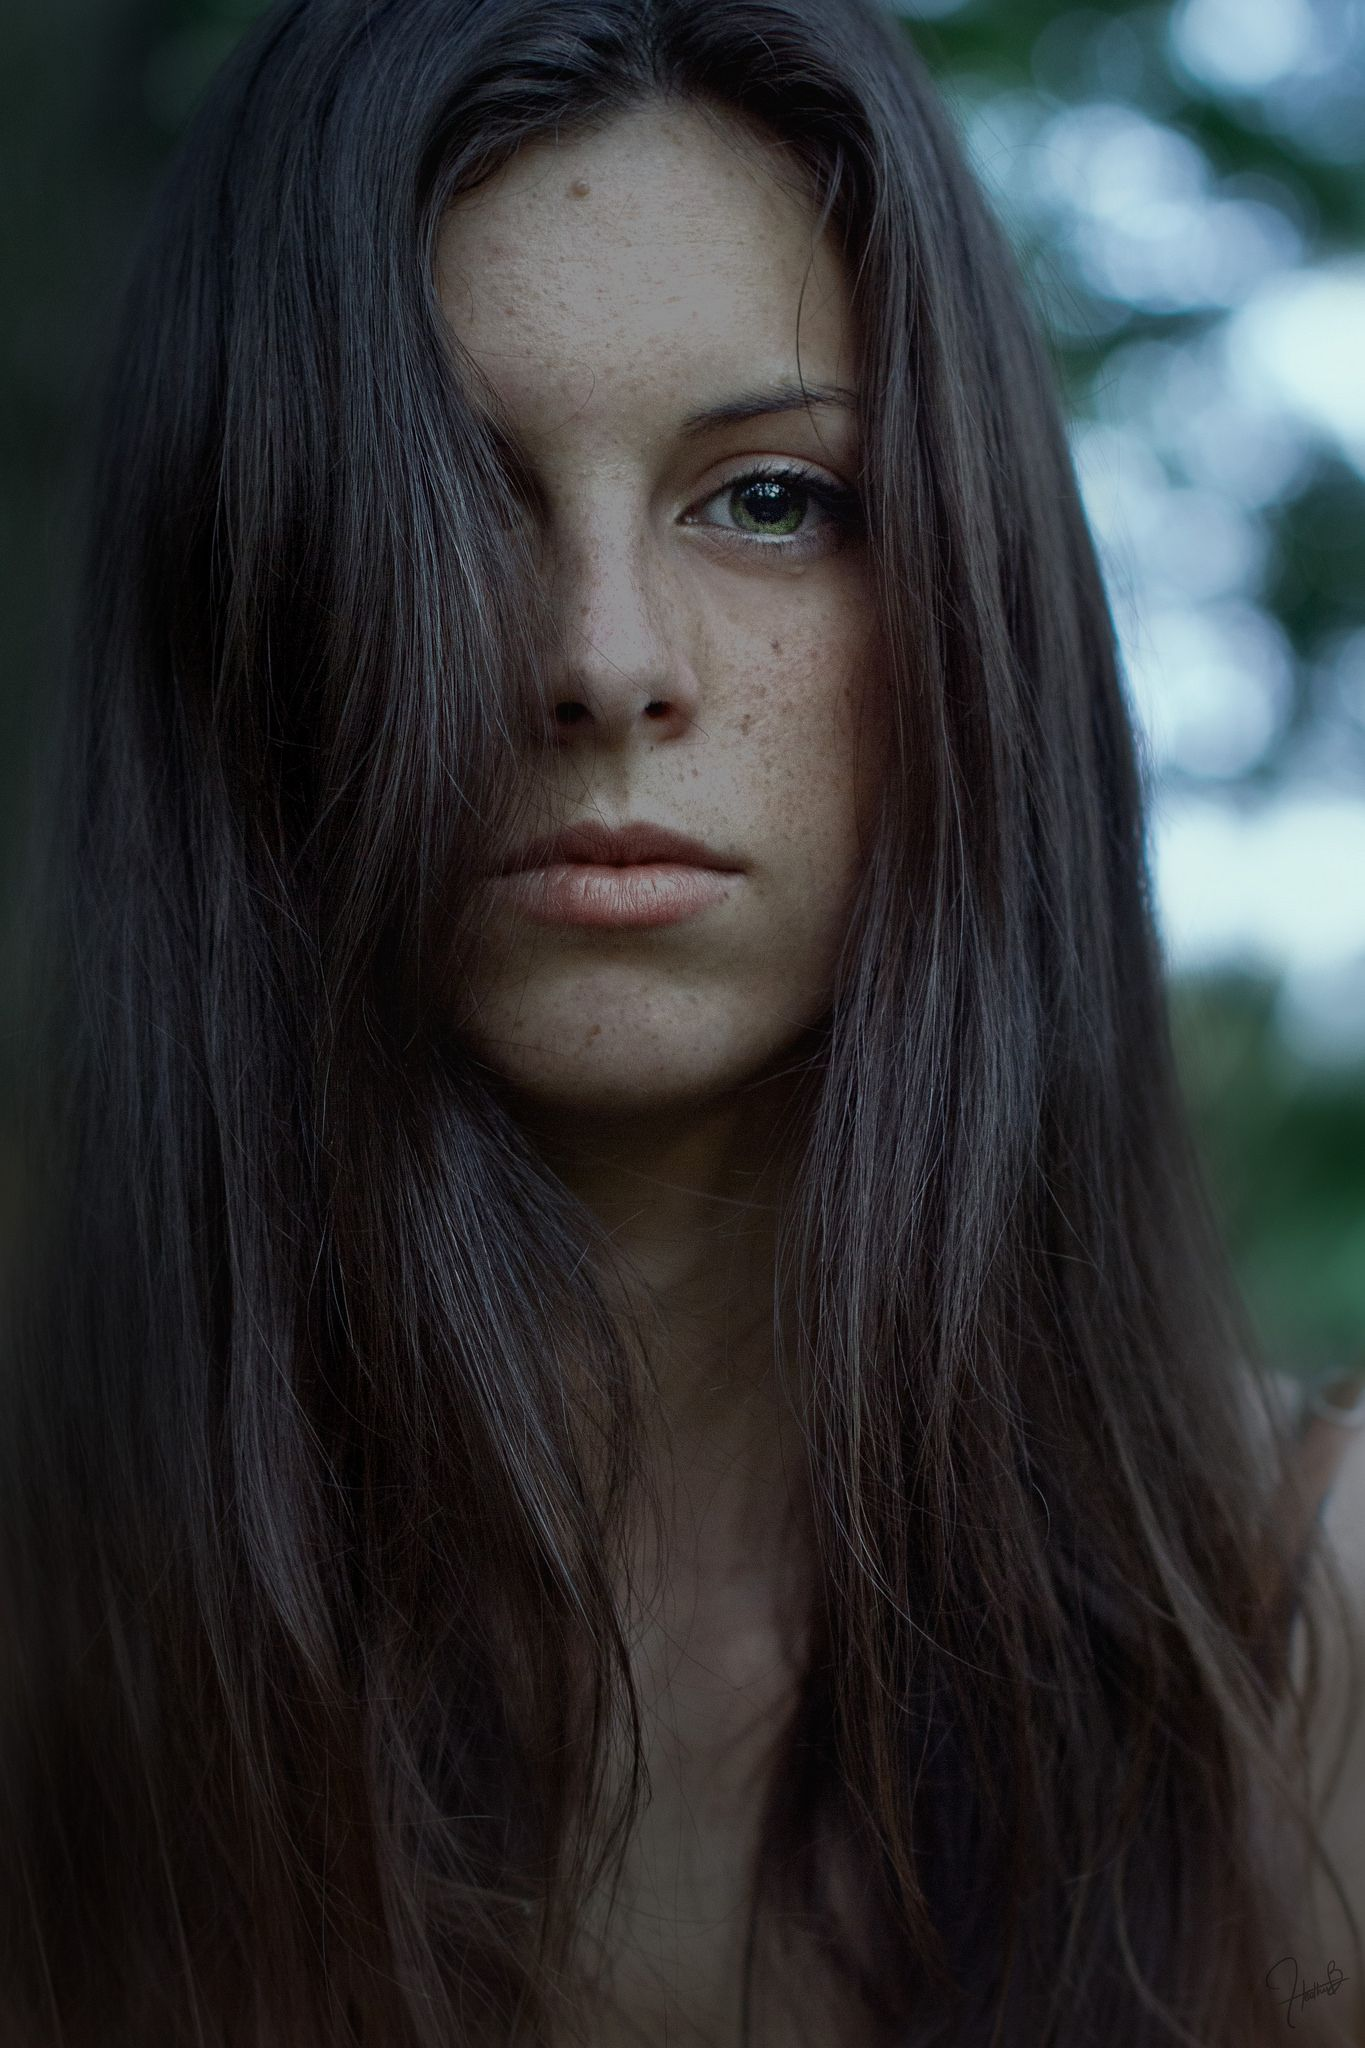 Portrait by Heather B. https://www.facebook.com/EricaBertolacciWorks?fref=photo  #model #shooting #inspiration #portrait #photography #fineart #fine #art #photographer #long #hair #brown #wood #forest #amazing #beautiful #beauty #eyes #green #blue #mood